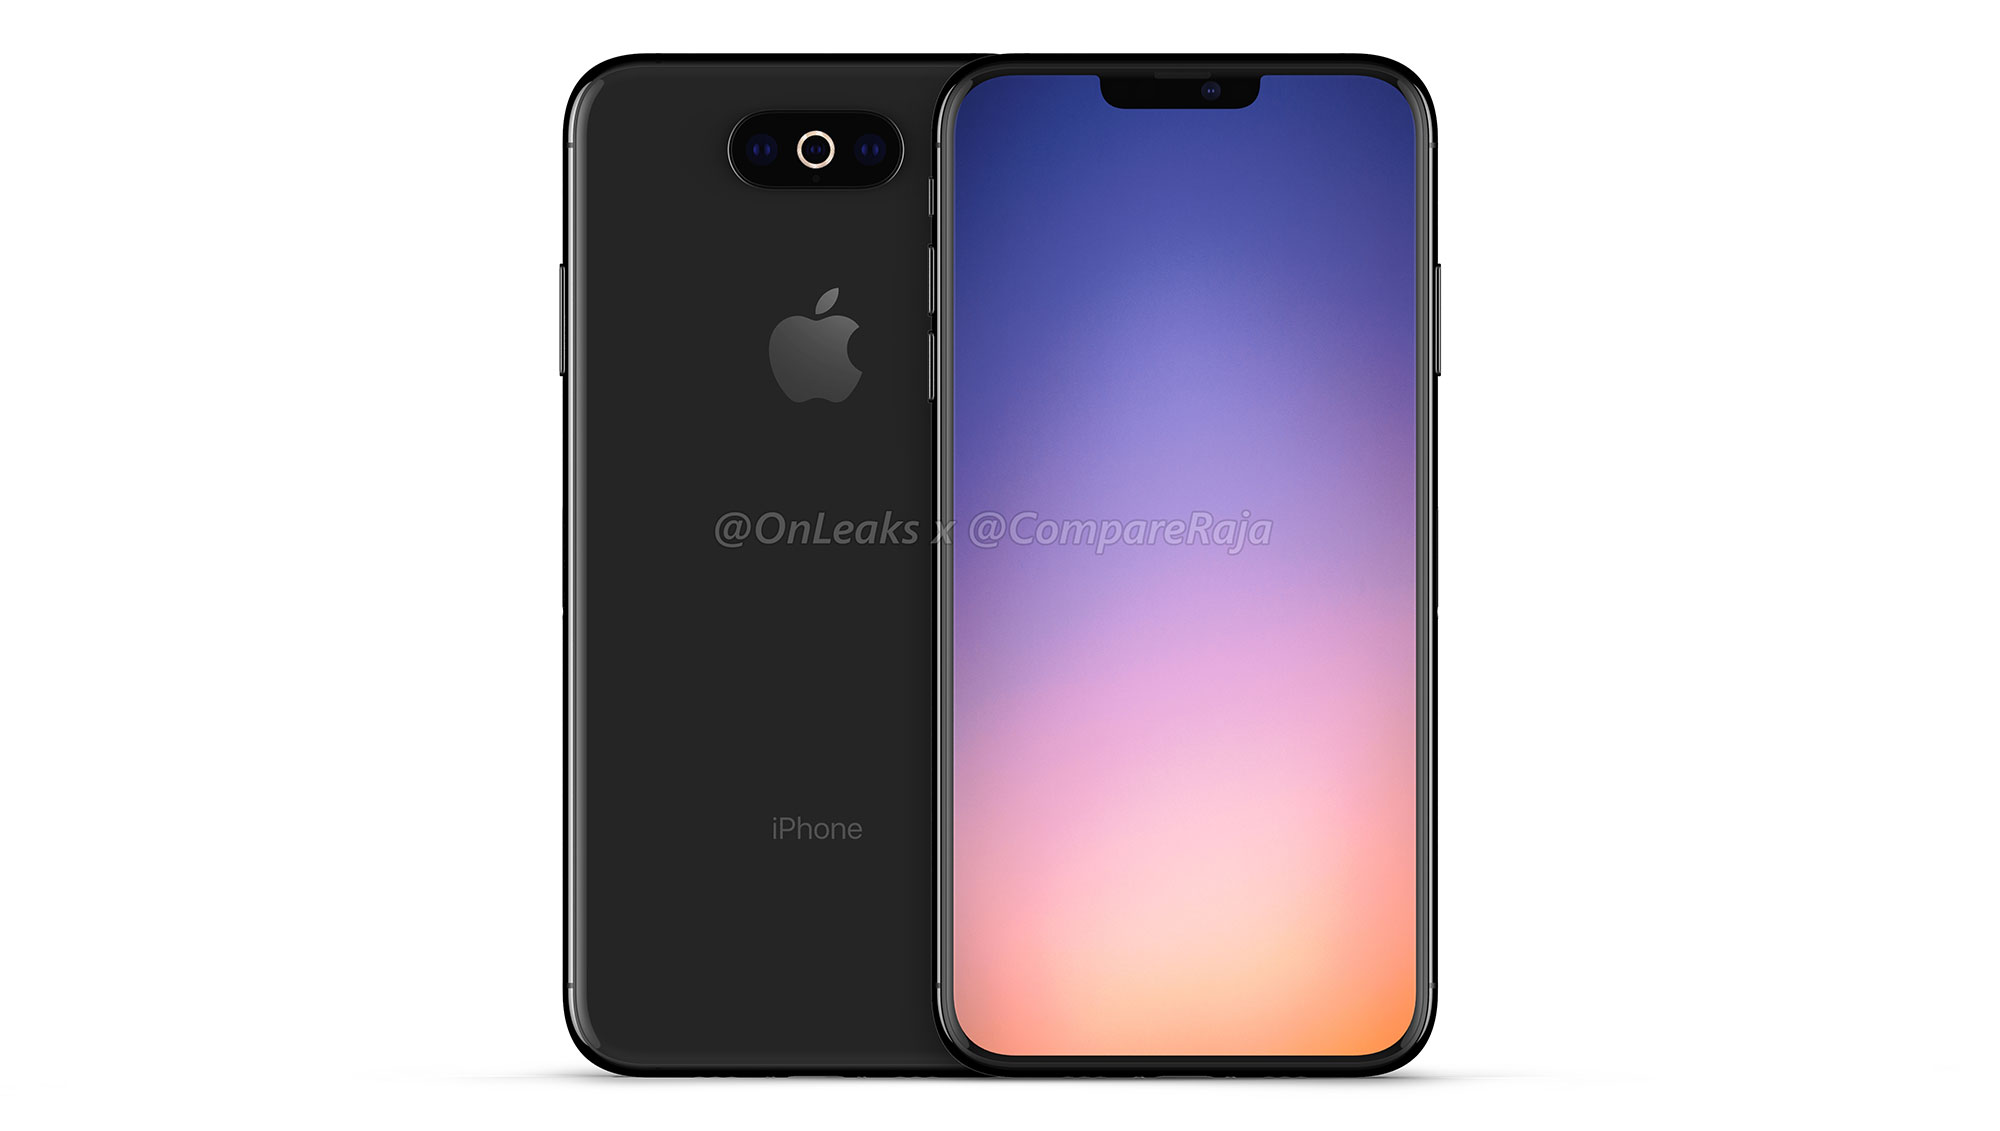 Onleaks 渲染全新 iPhone Xl:三摄像头横置、刘海缩小